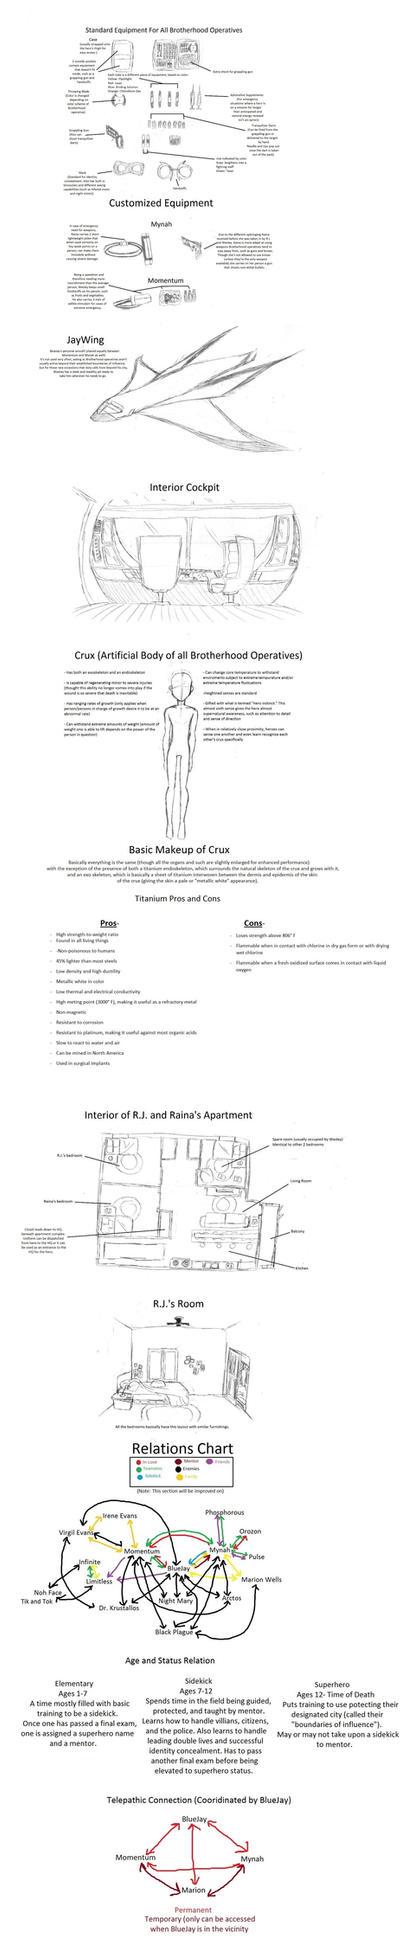 BlueJay Misc Information Sheet by BuddhatheBob